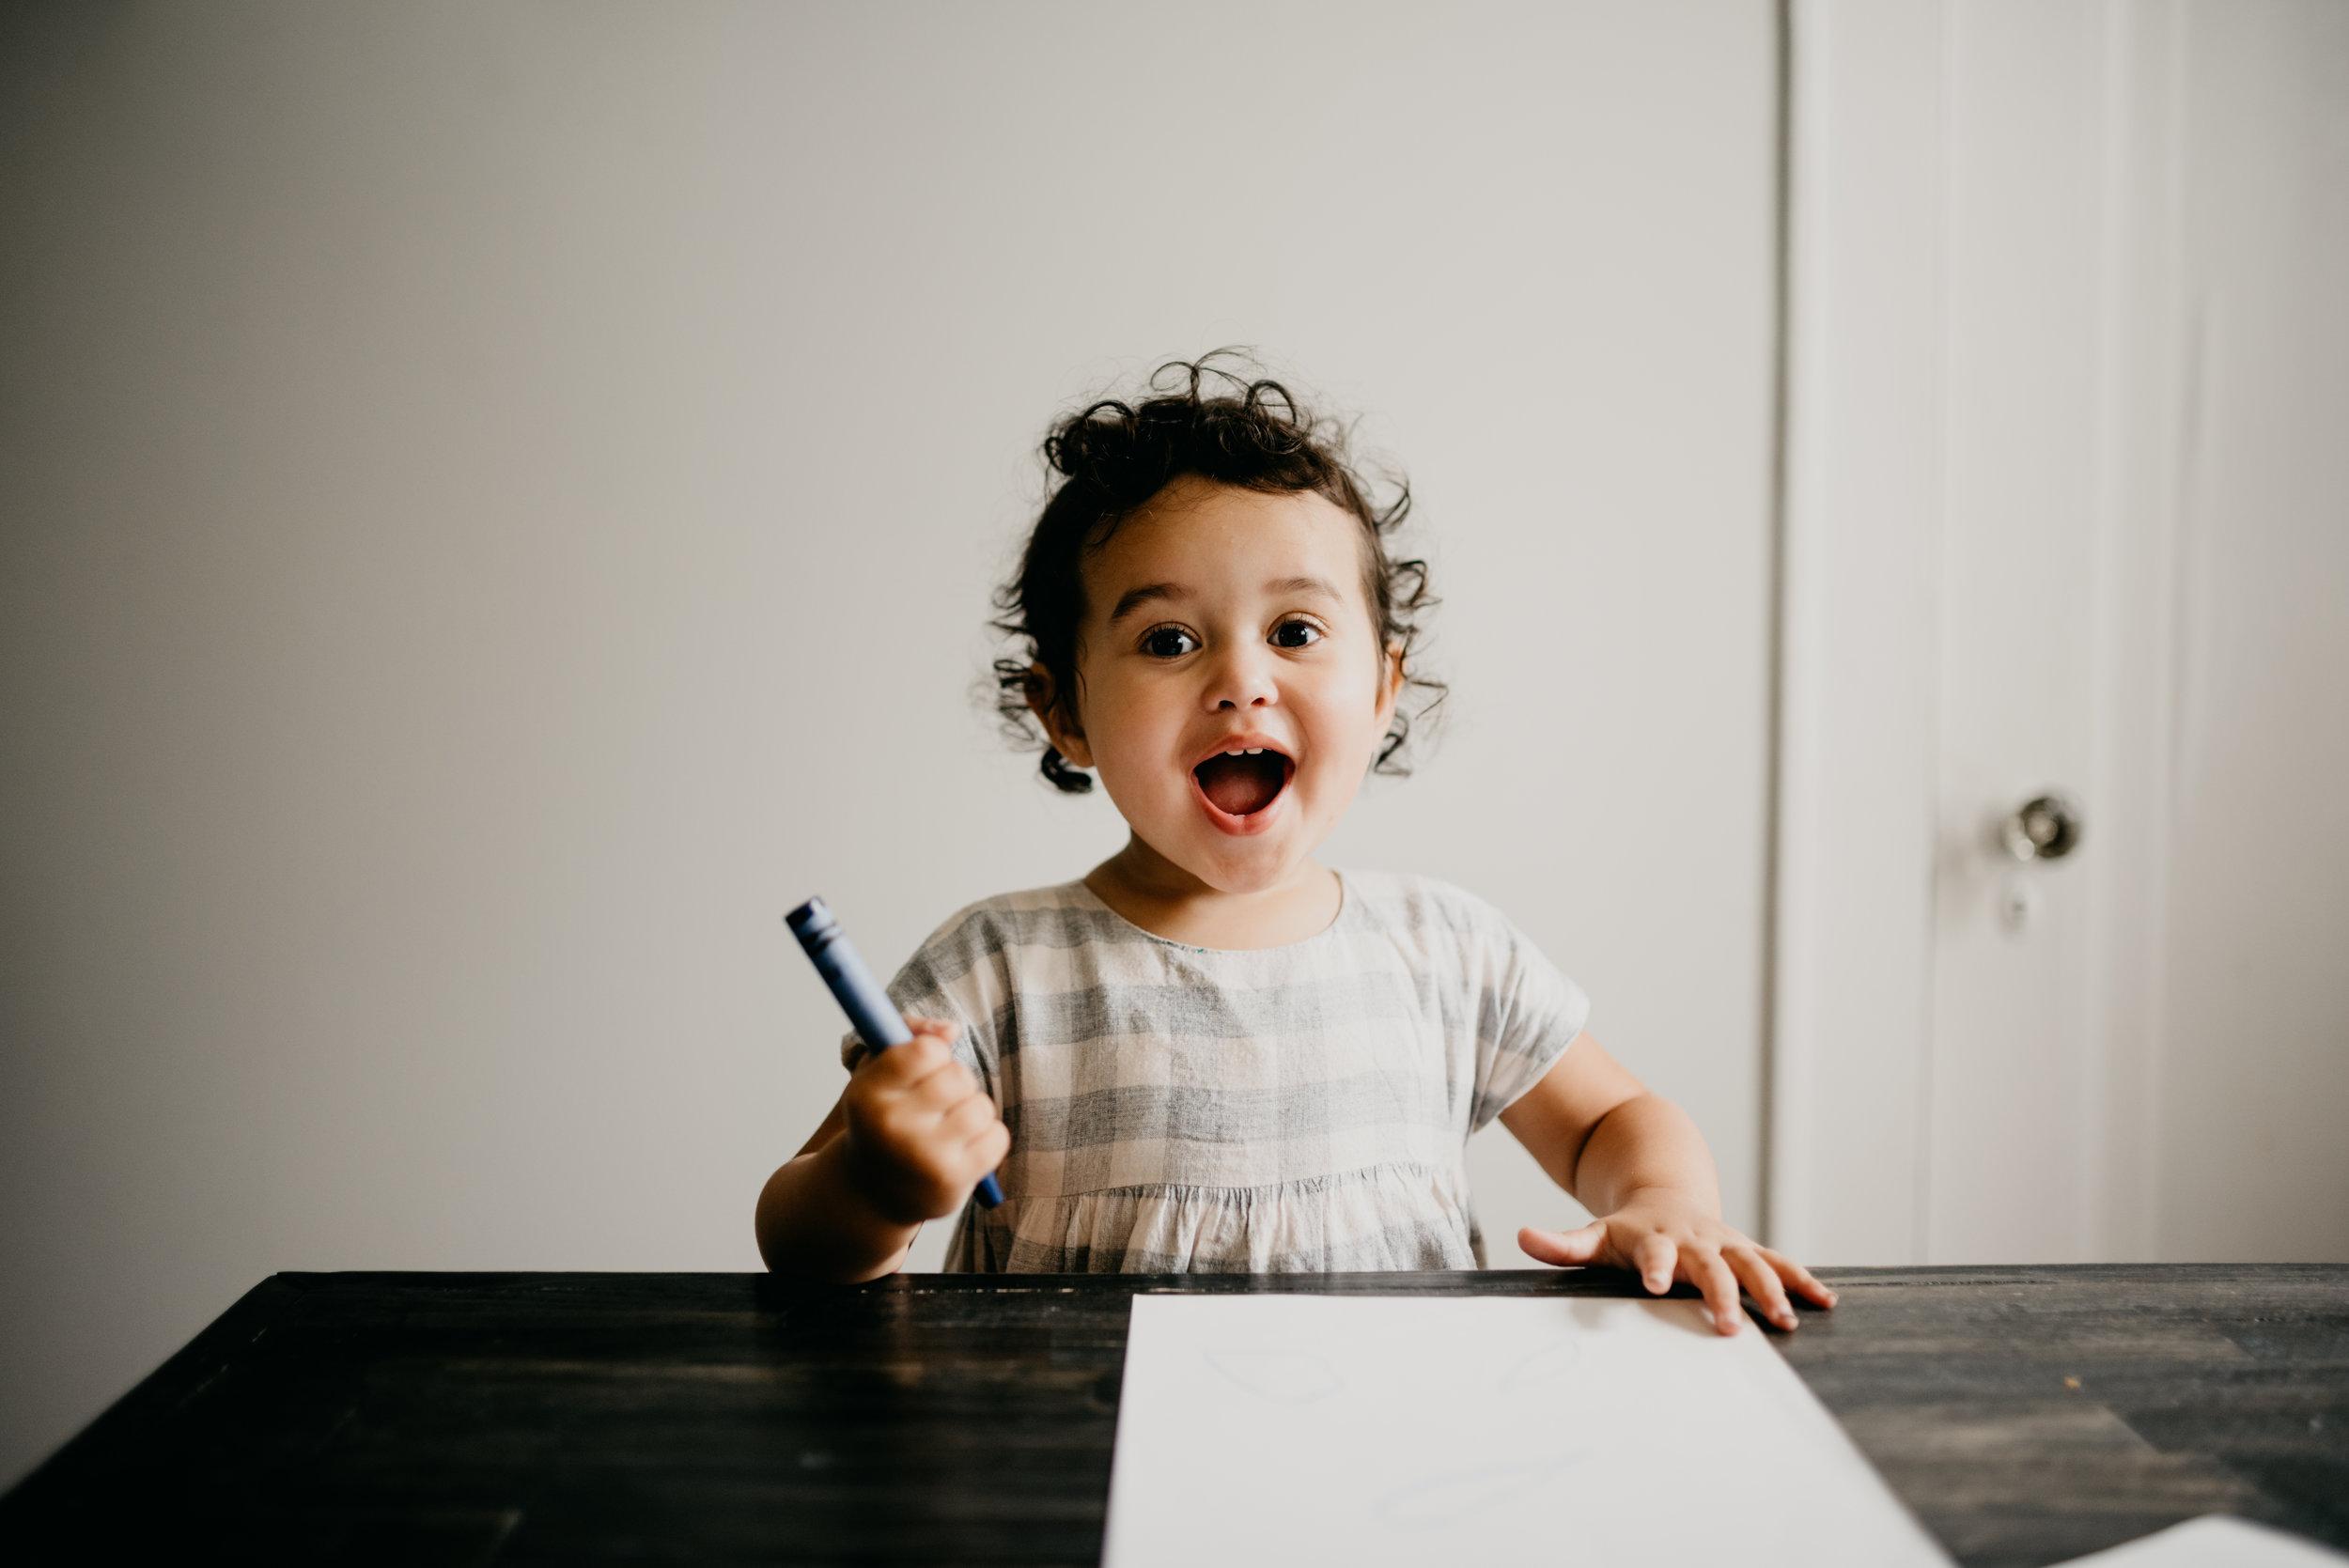 Ehrman-Massachusetts-In Home Lifestyle Maternity Session-Documentary Family Photographer-786.jpg